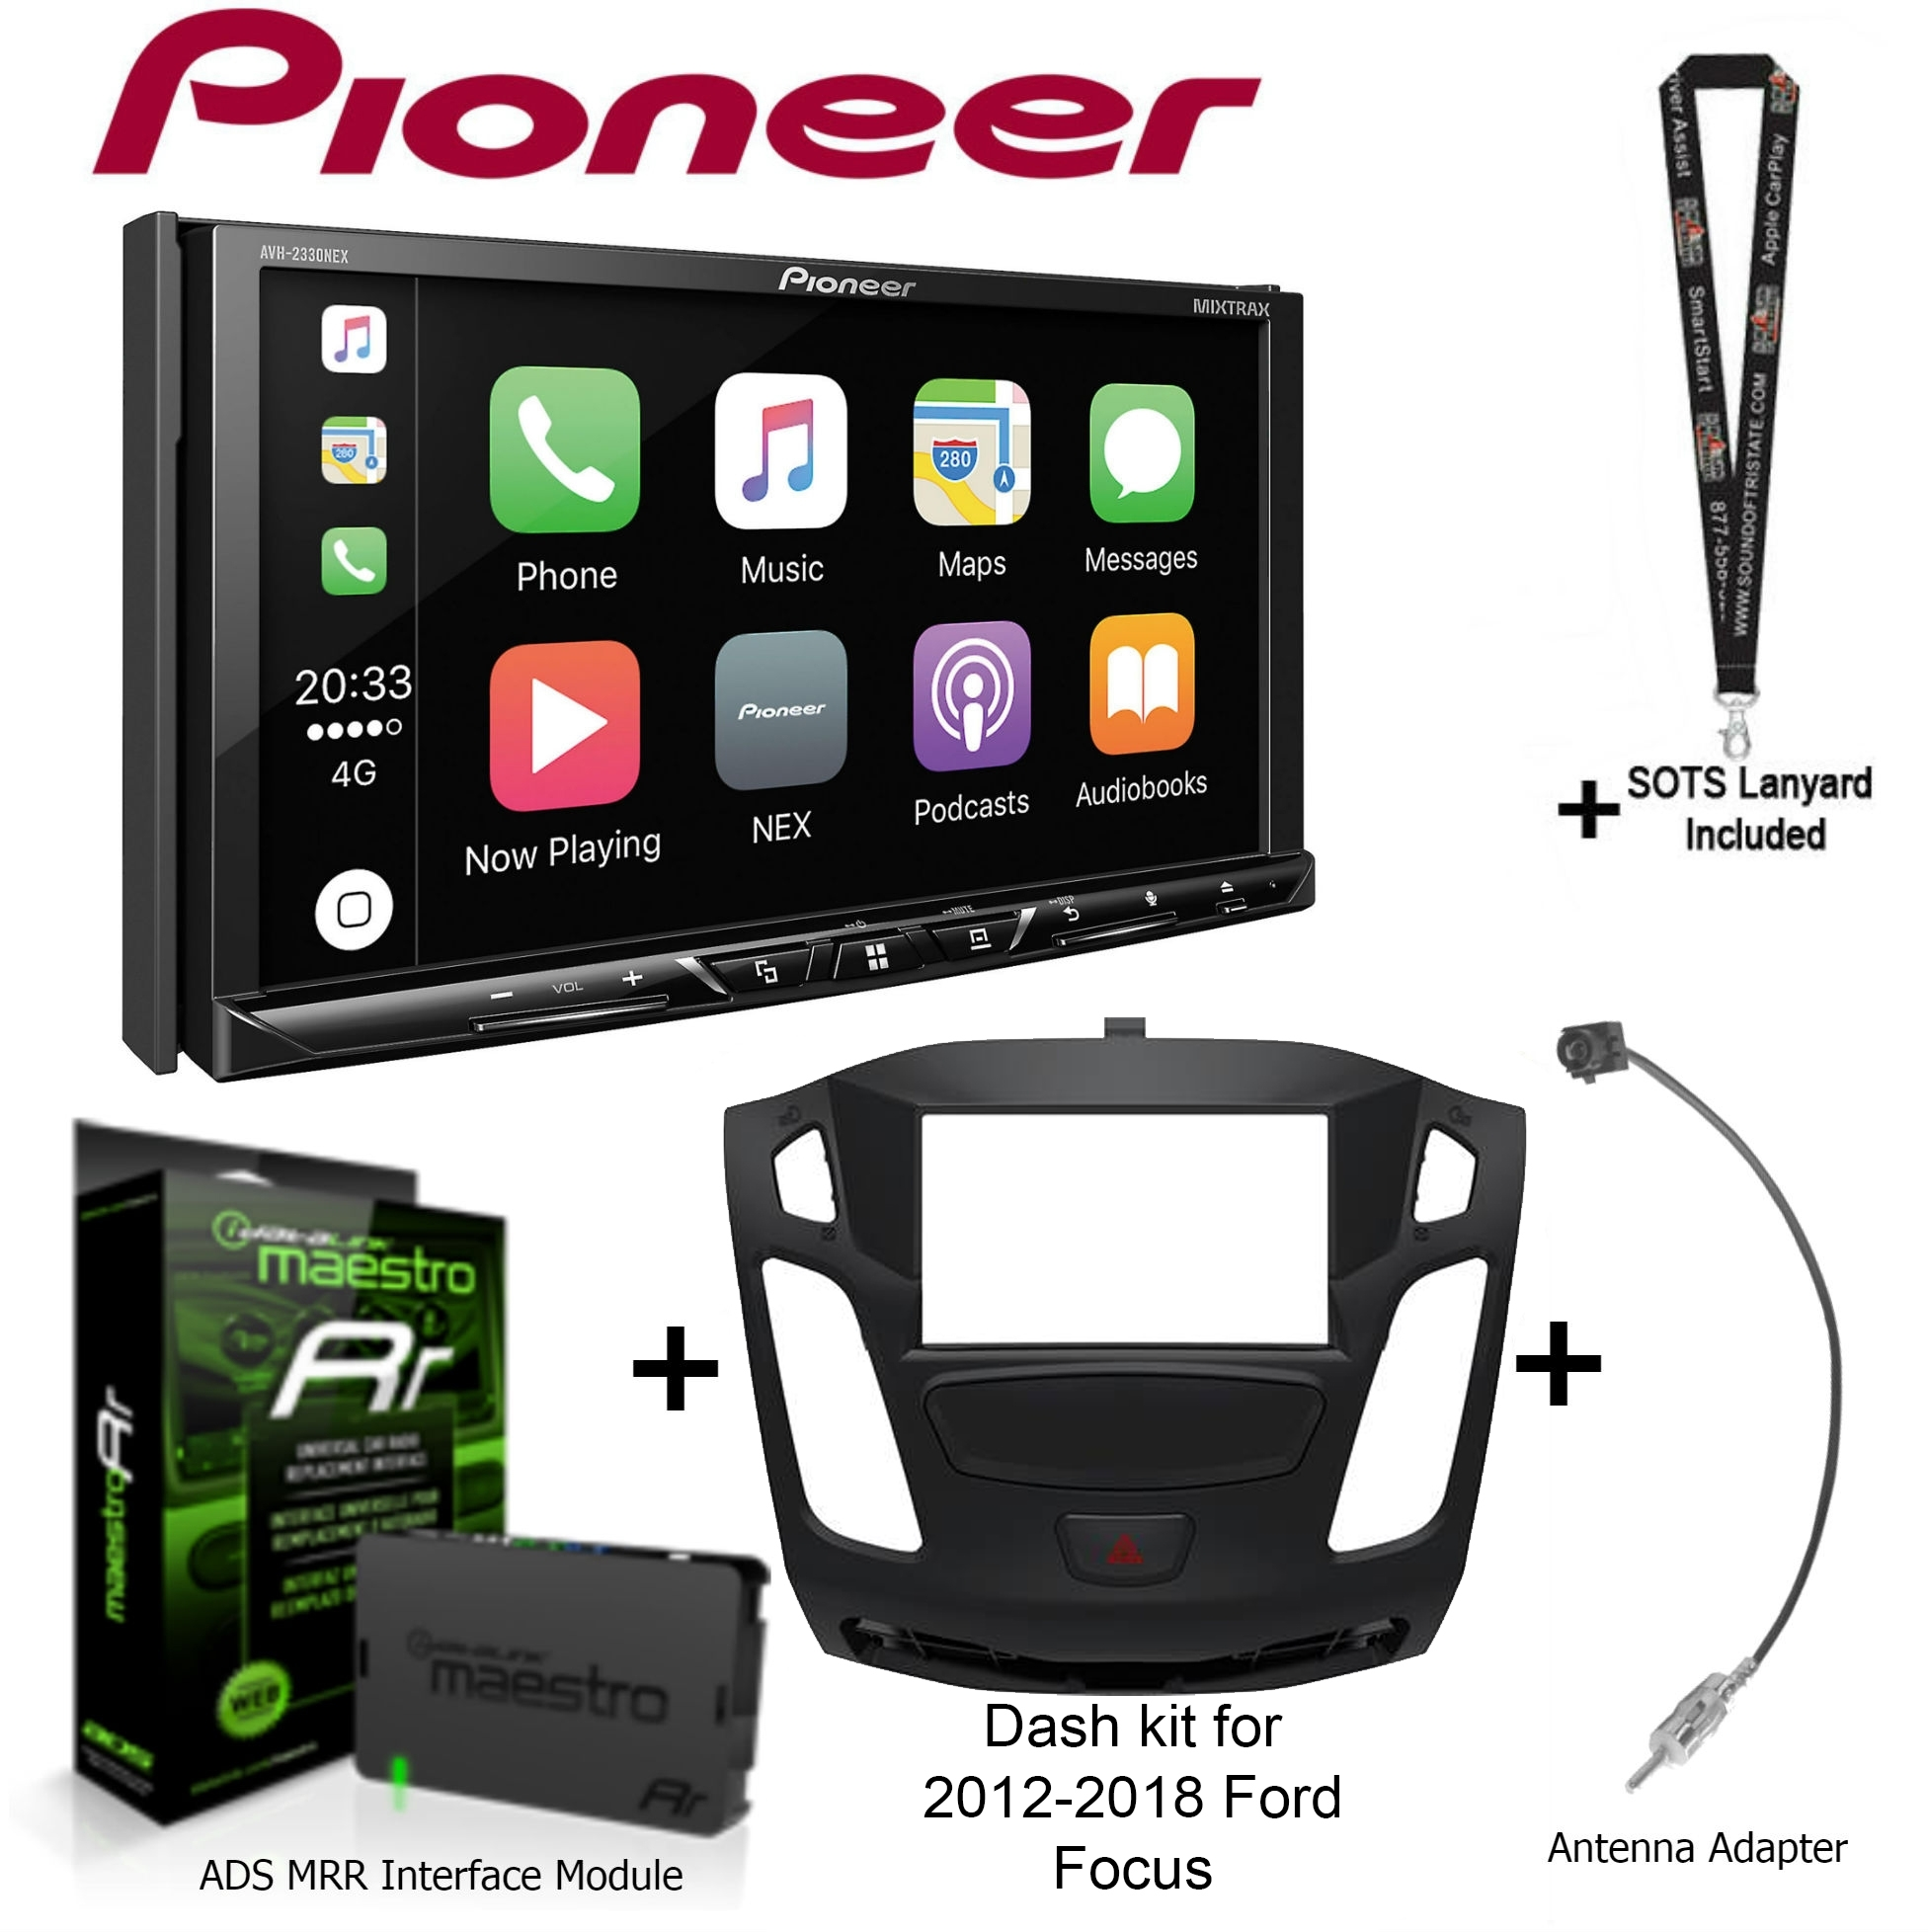 "Pioneer AVH-2330NEX 7"" DVD Receiver, iDatalink Maestro KIT-FOC1 Dash kit for 2012-2018 Ford Focus, ADS-MRR... by Pioneer"